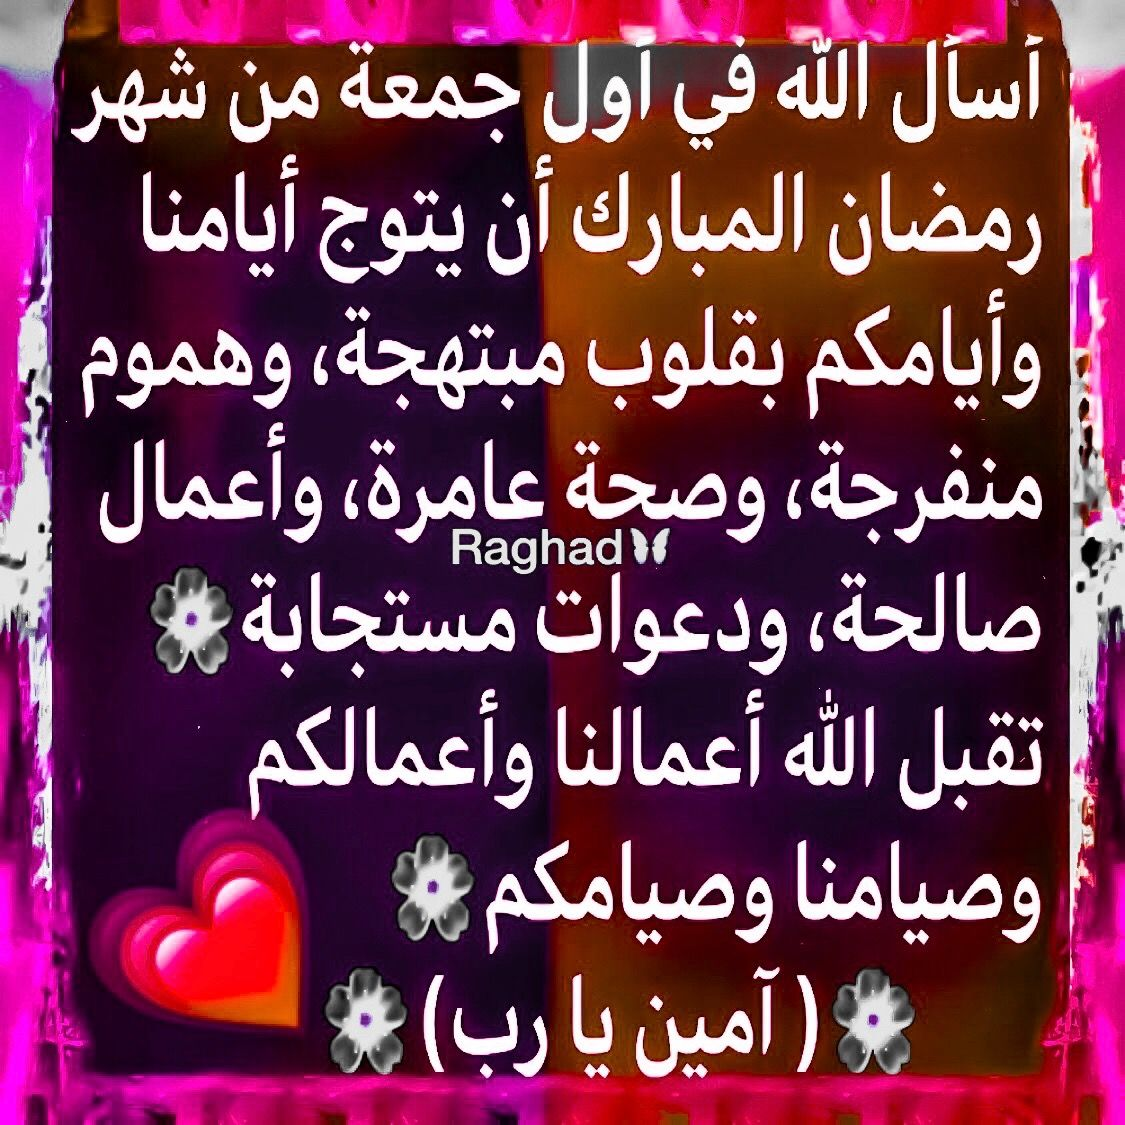 Desertrose أسأل الله في أول جمعة من شهر رمضان المبارك أن يتوج أيامنا وأيامكم بقلوب مبتهجة وهموم منفرجة وصحة عامرة وأع Ramadan Kareem Ramadan Neon Signs